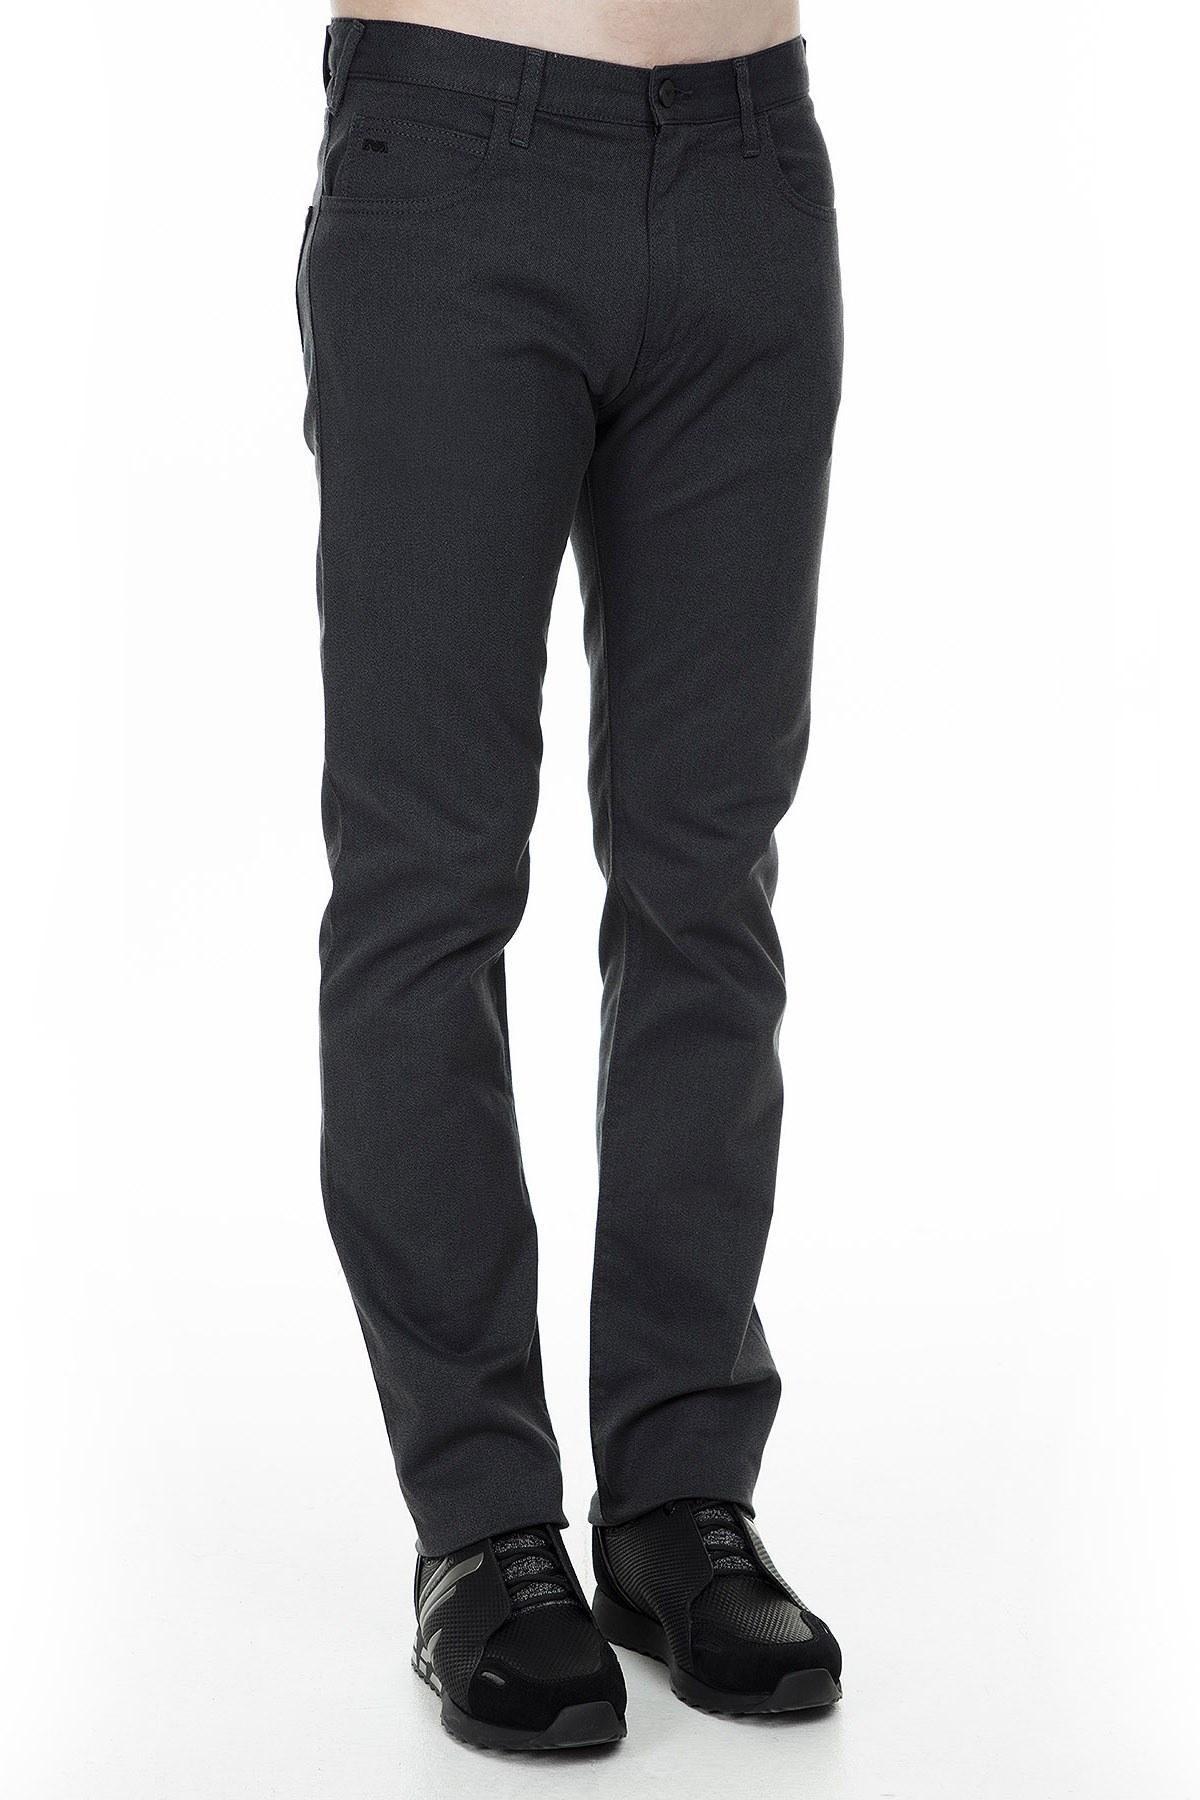 Emporio Armani J45 Jeans Erkek Pamuklu Pantolon 6G1J45 1N50Z 0644 GRİ